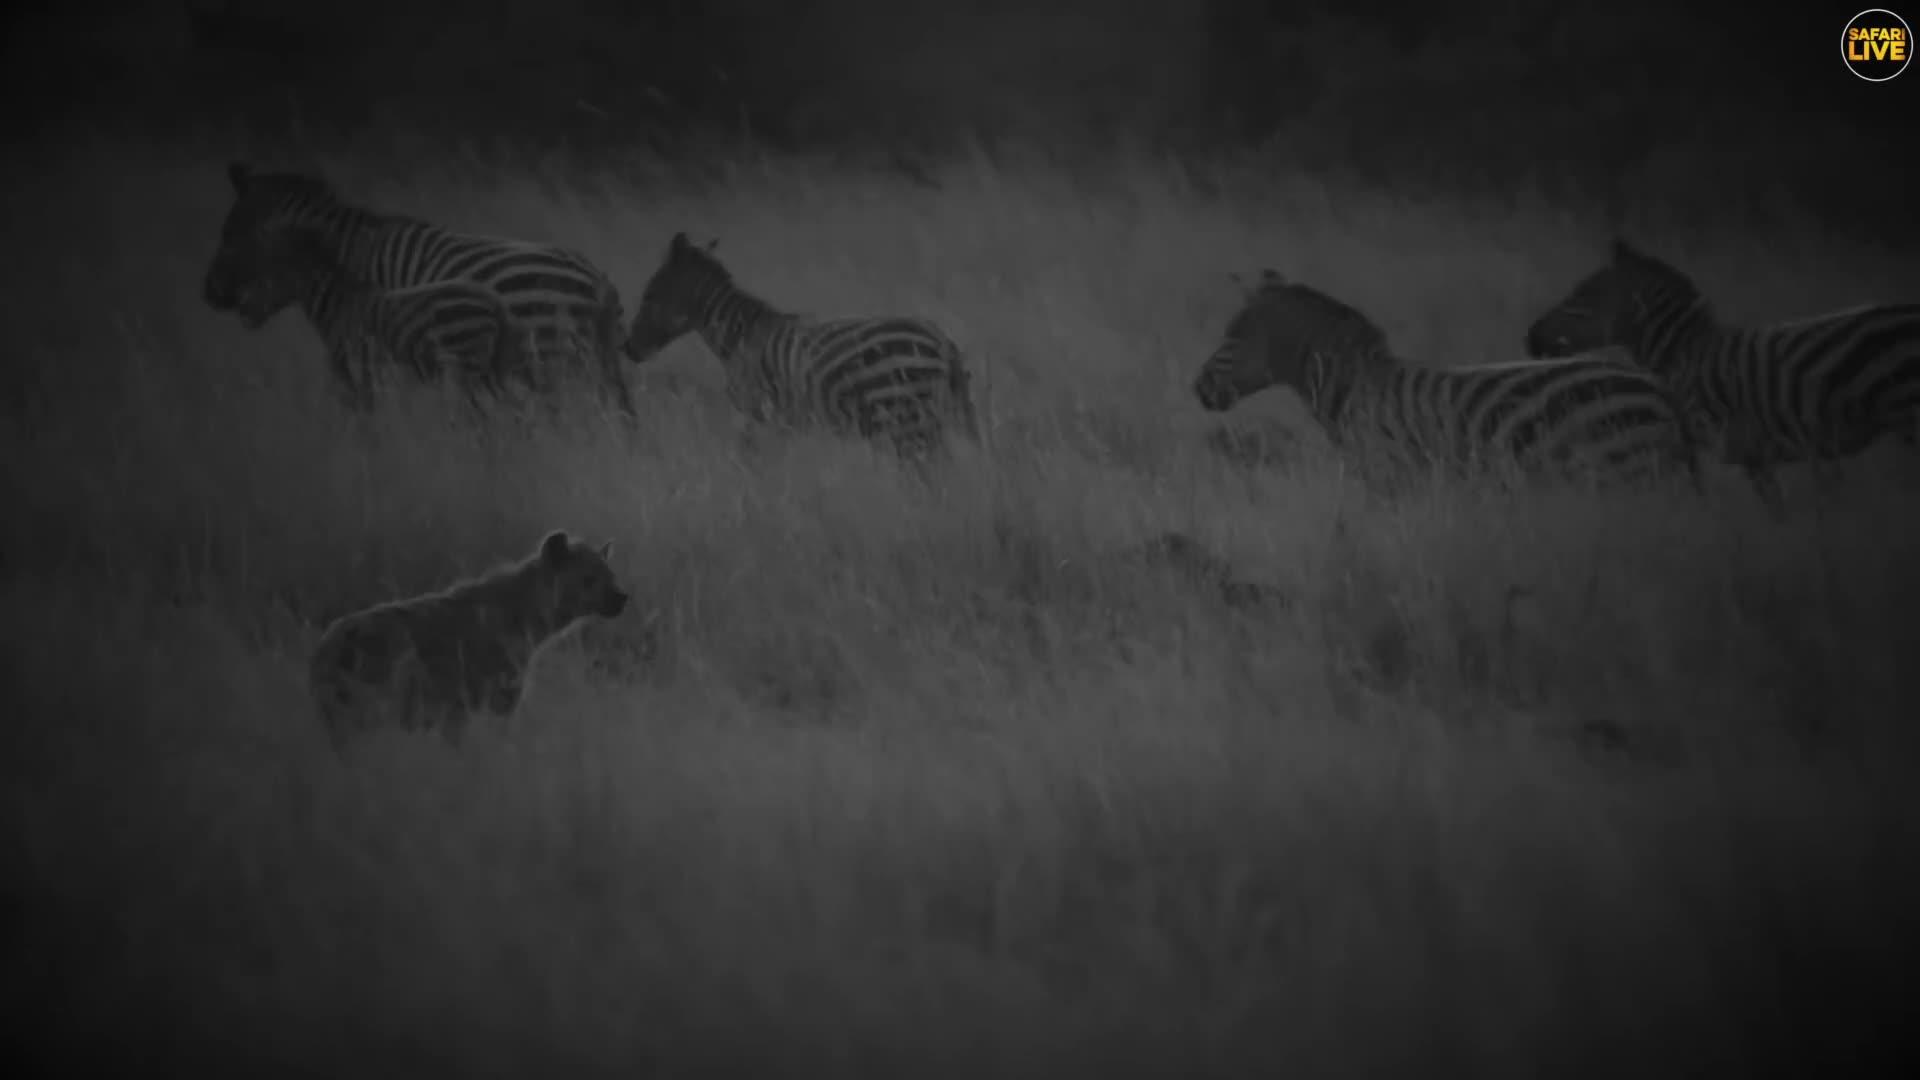 Hyenas capitalise on a zebra injured by a crocodile GIFs